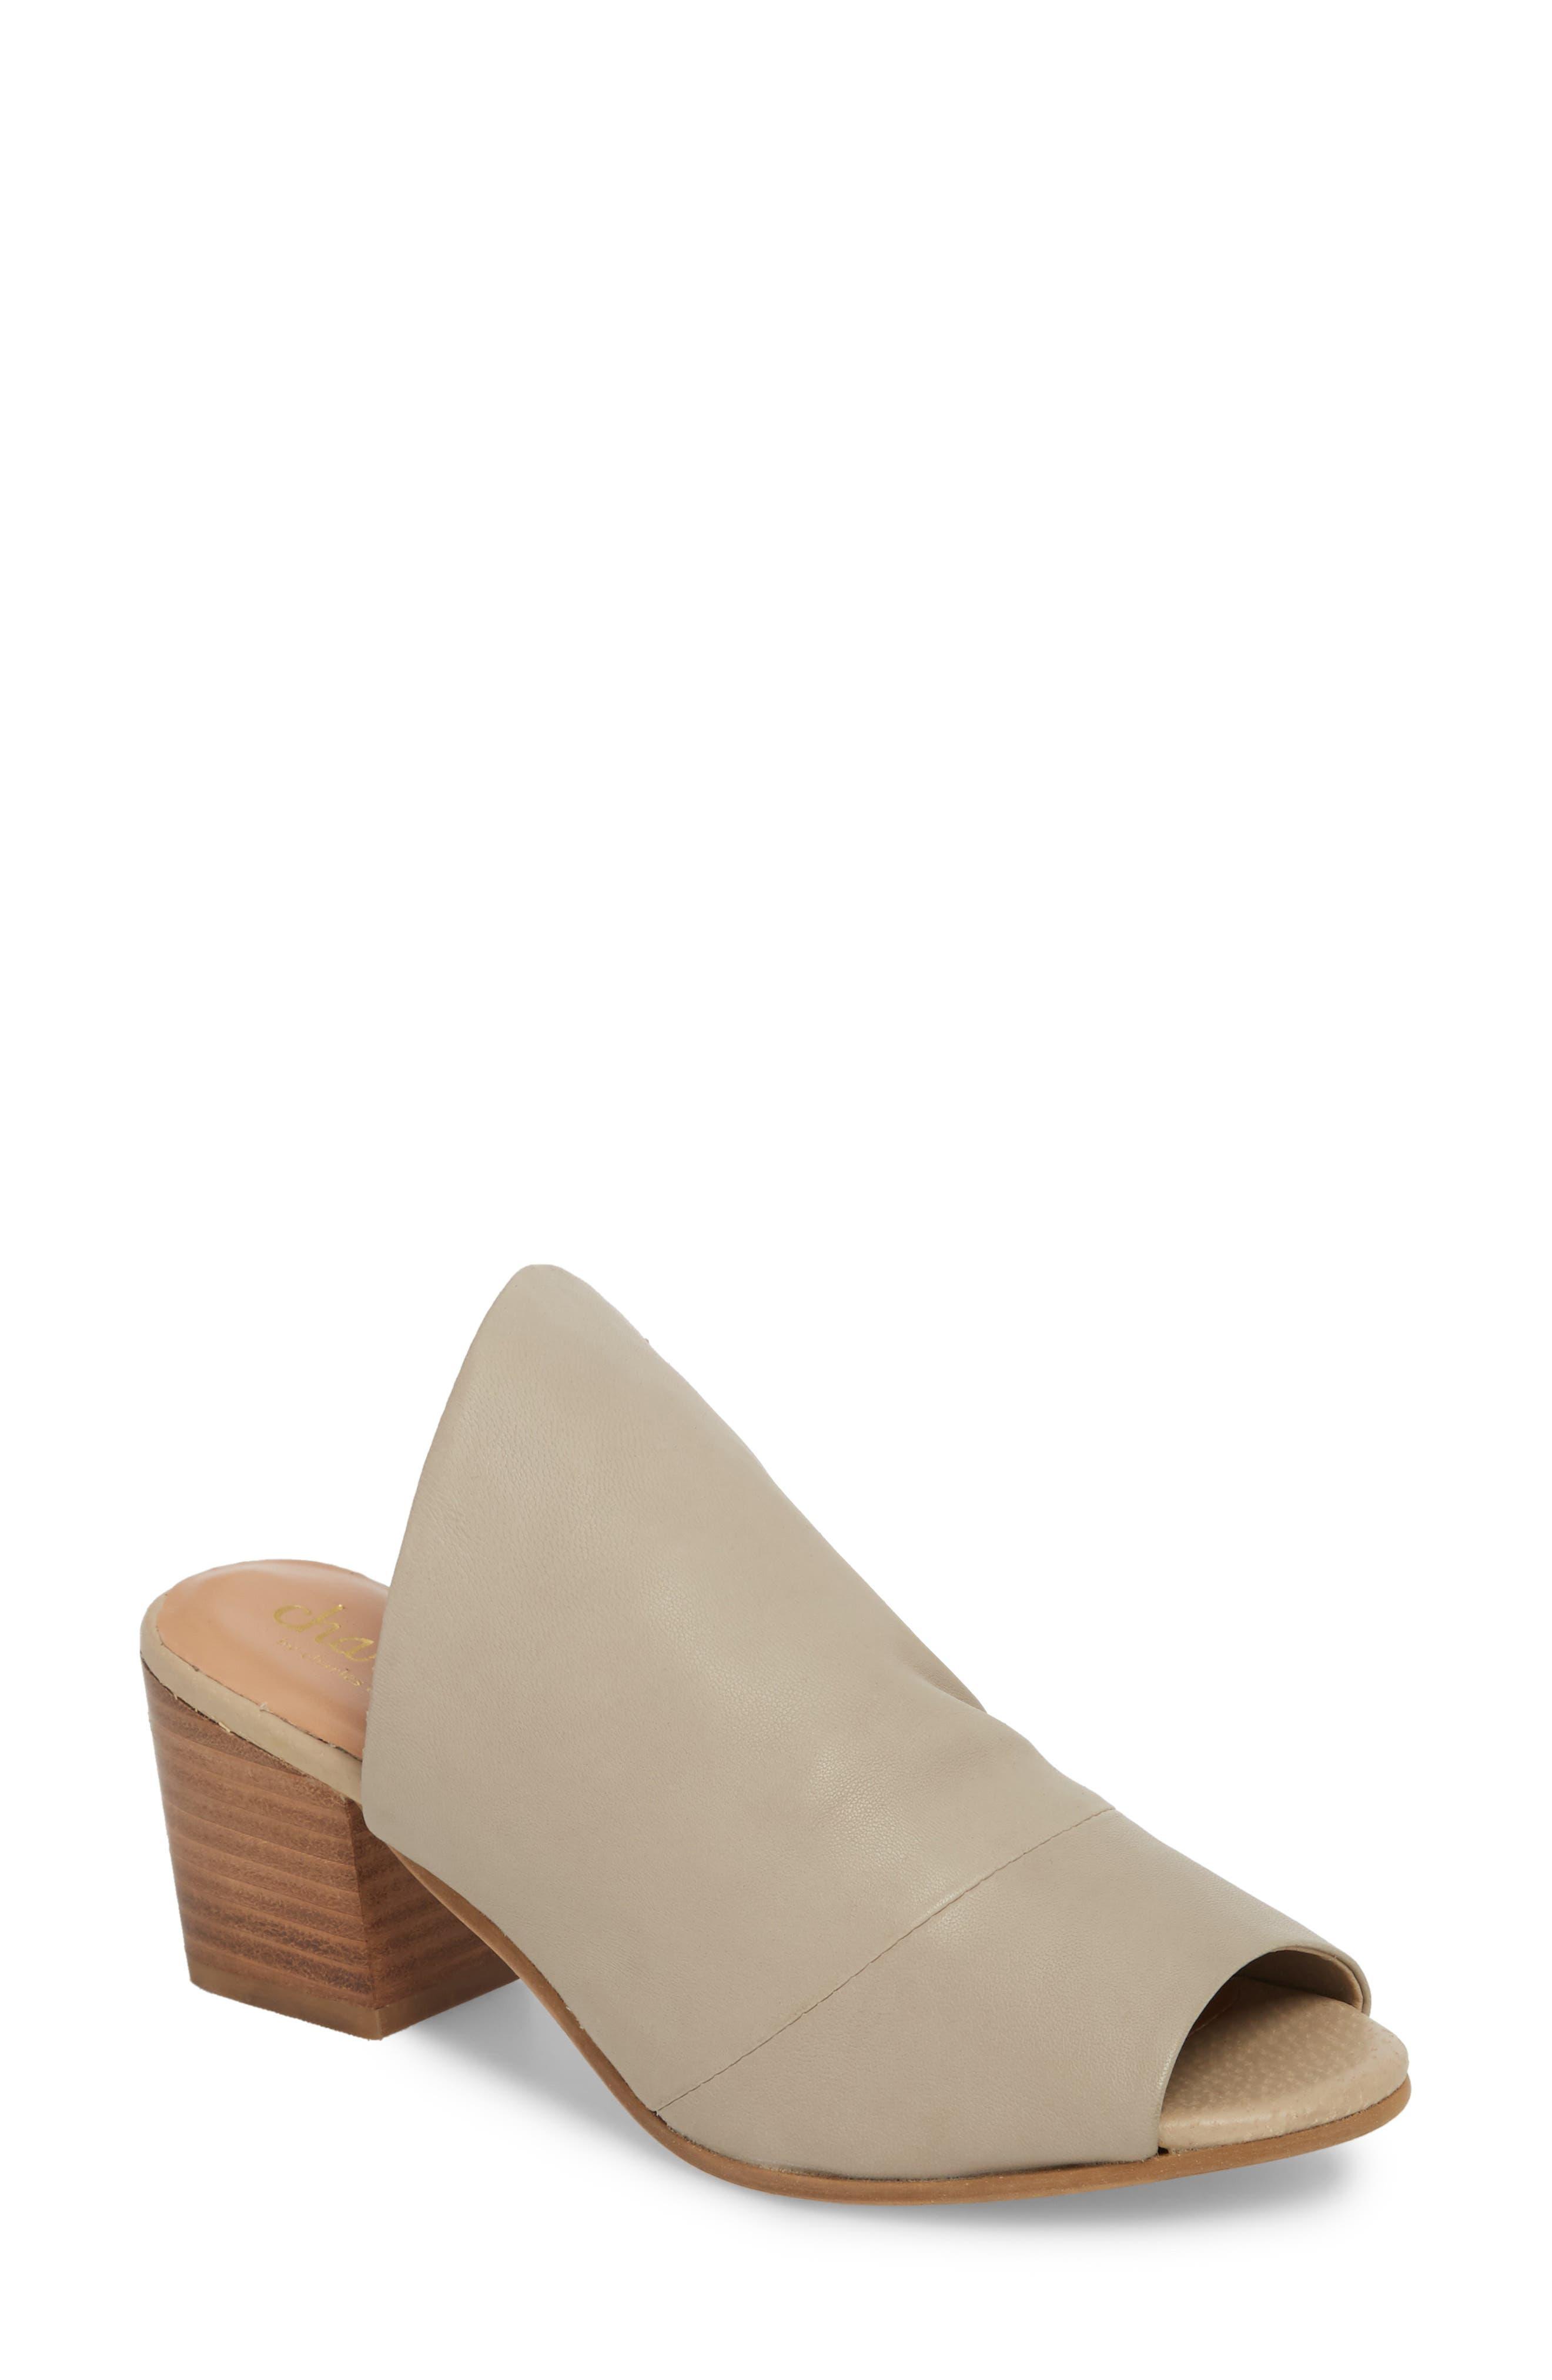 Charles David Women's Yanna Block Heel Slide Sandal VHFWS5x